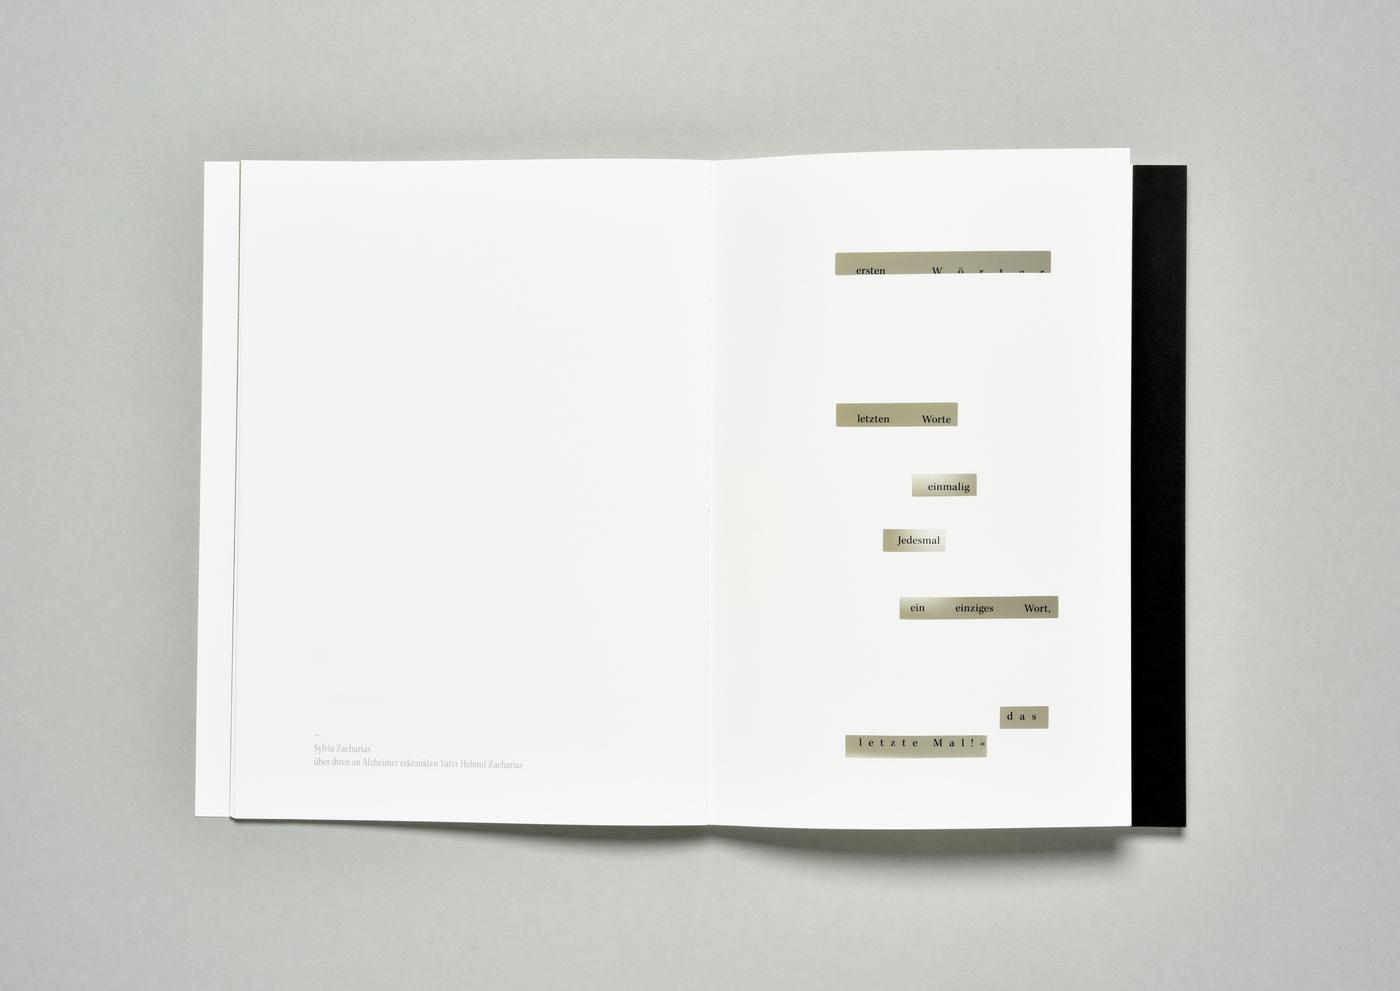 book buch demenz dementia Gedächtnis Krankheit Gesundheit fadenbindung